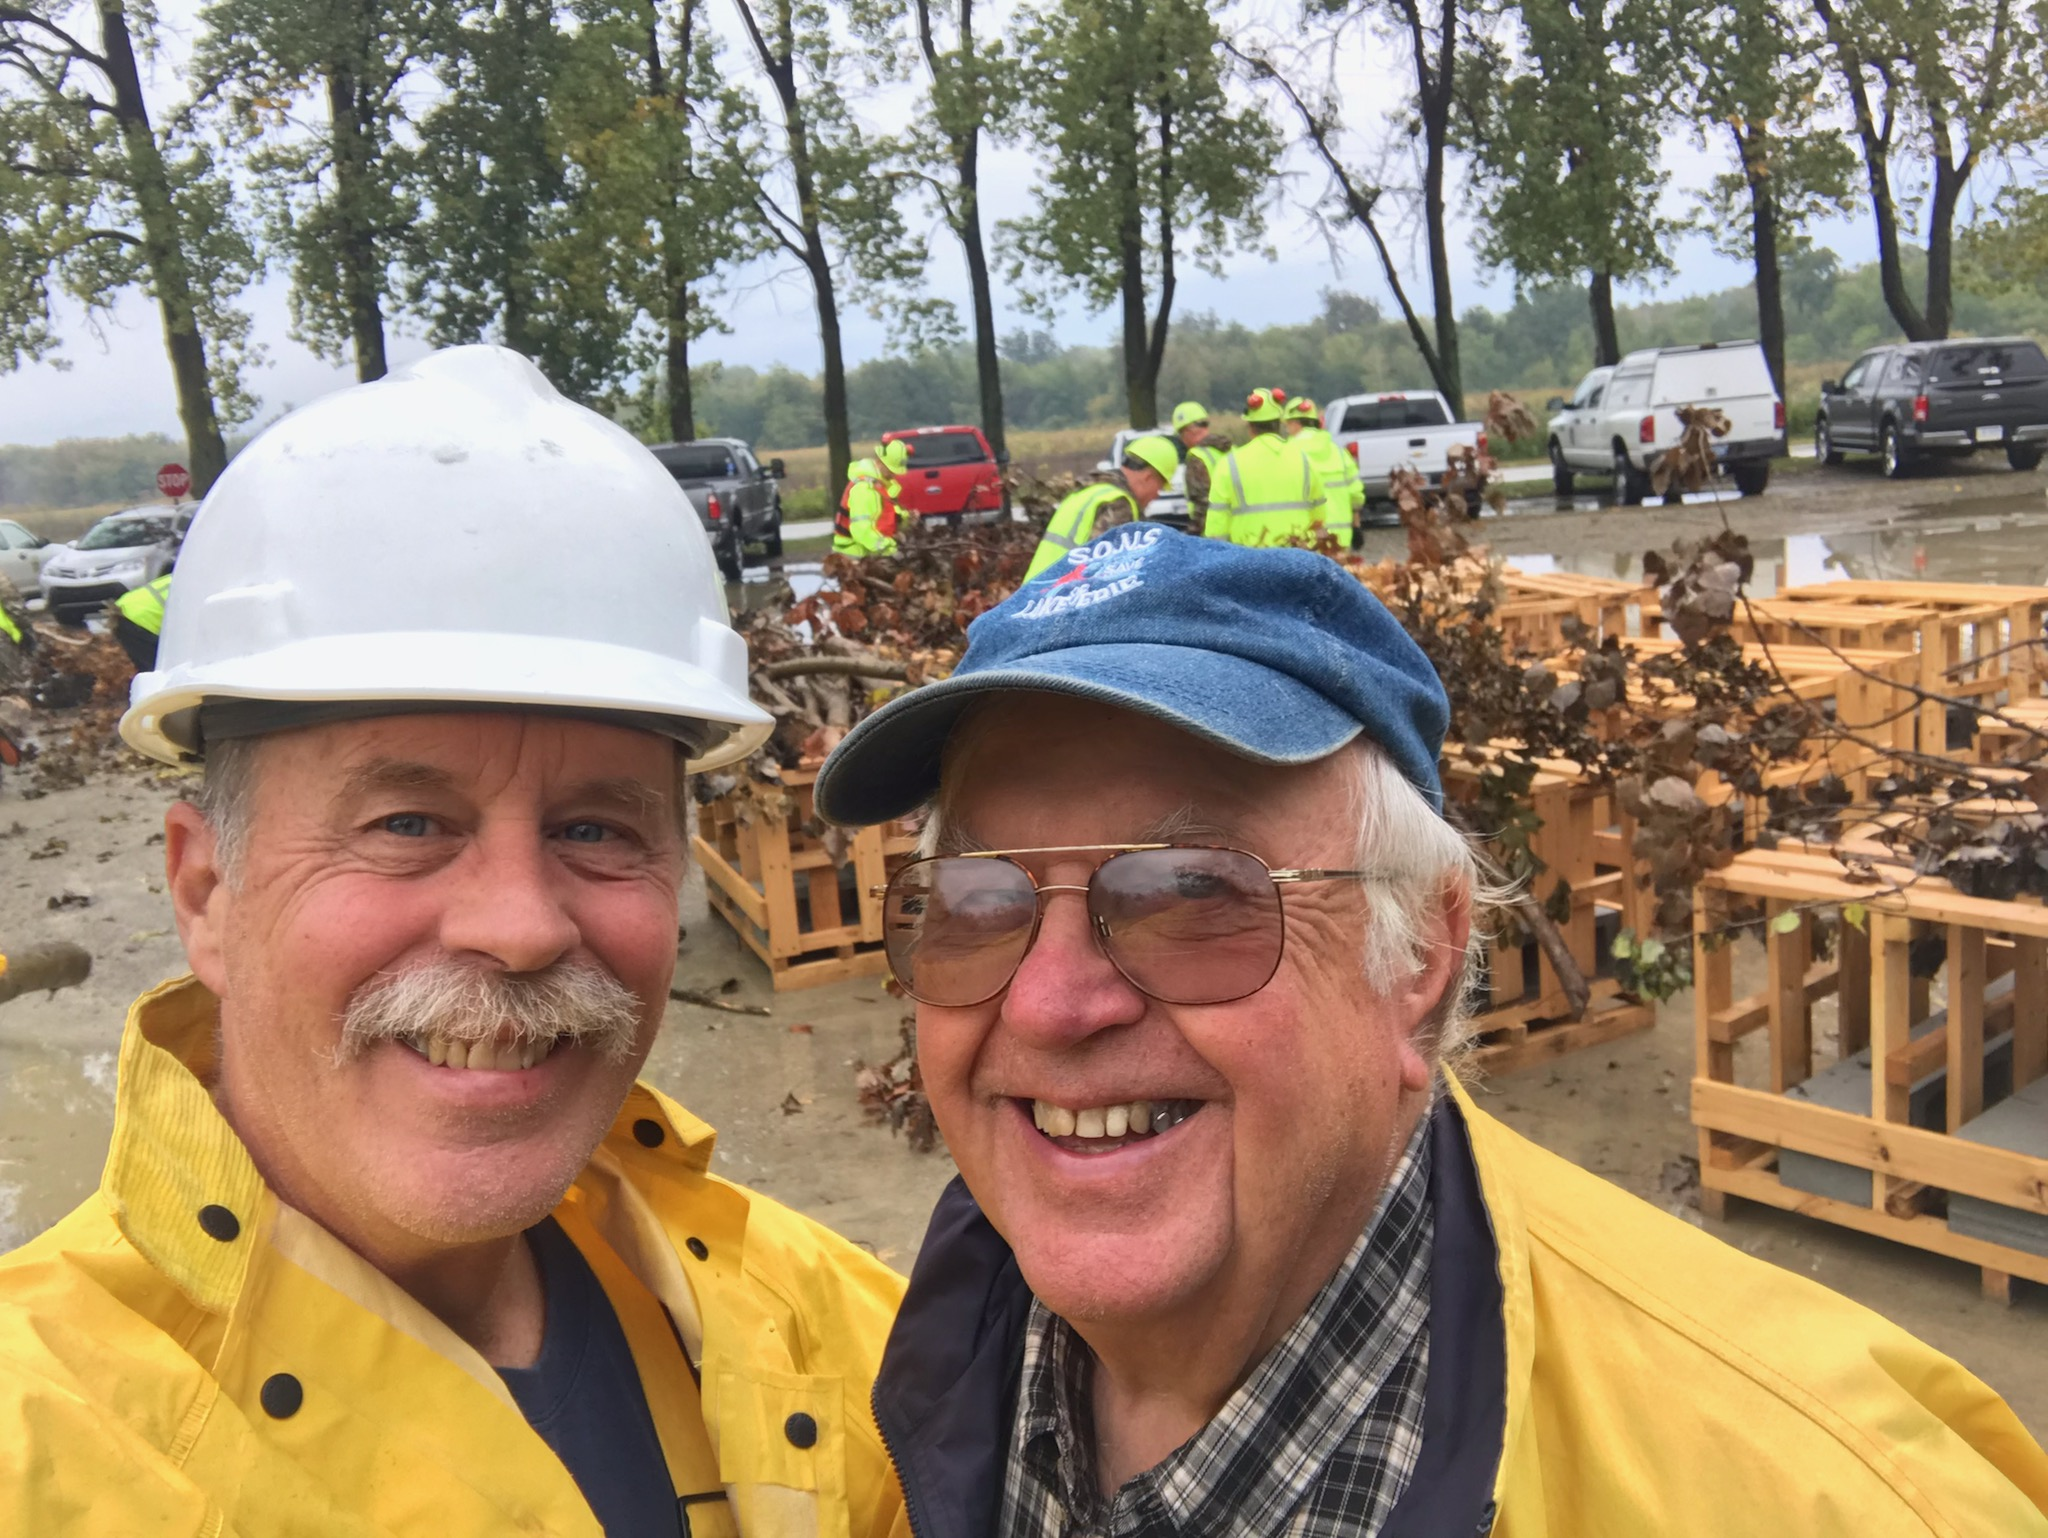 David Boughton and Jerry Skrypzak, S.O.N.S. of Lake Erie